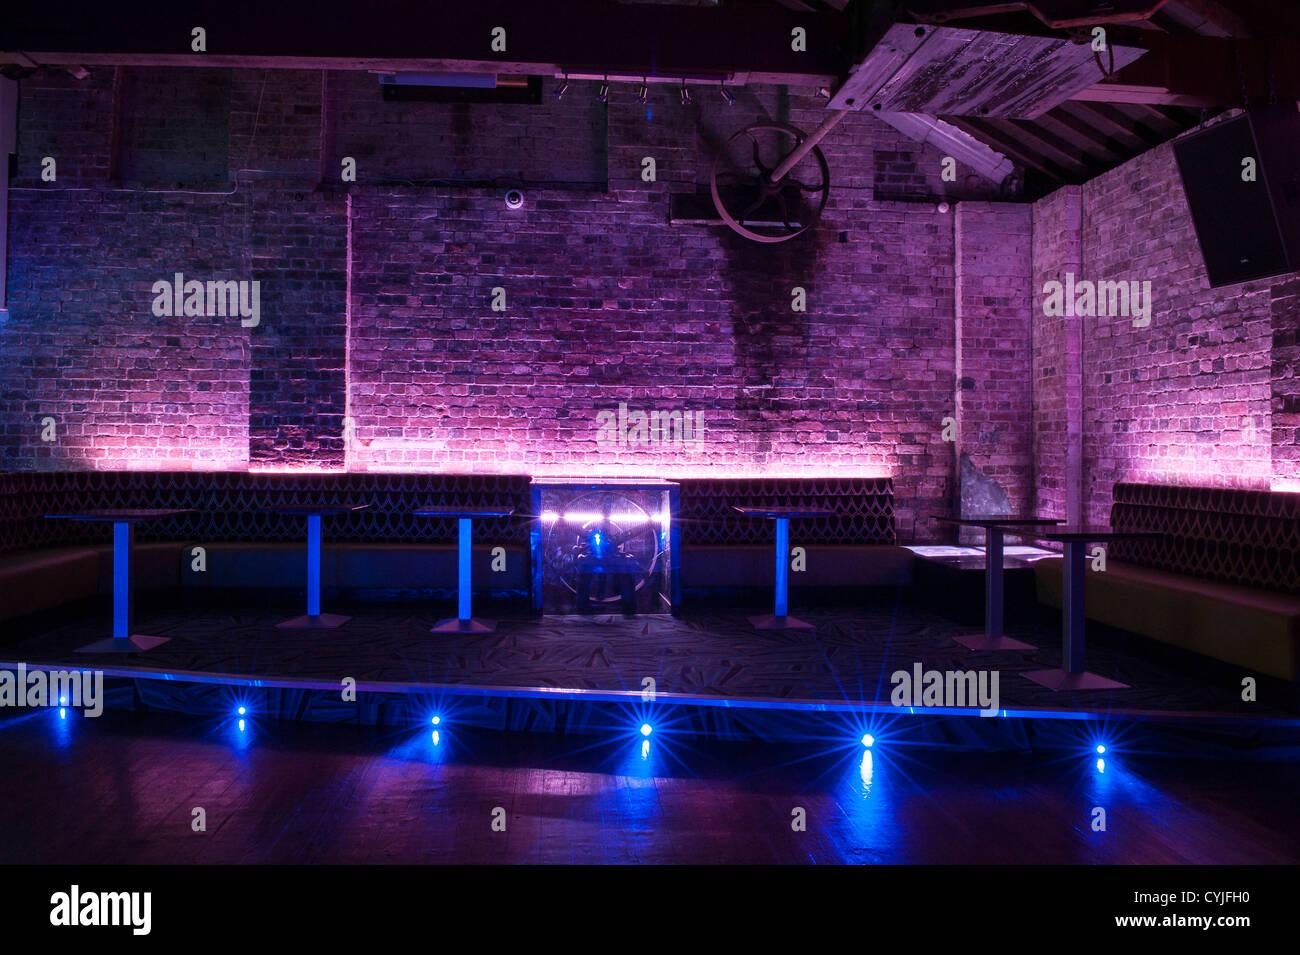 Beautiful Night Club Dance Floor And Seating, Interior Design